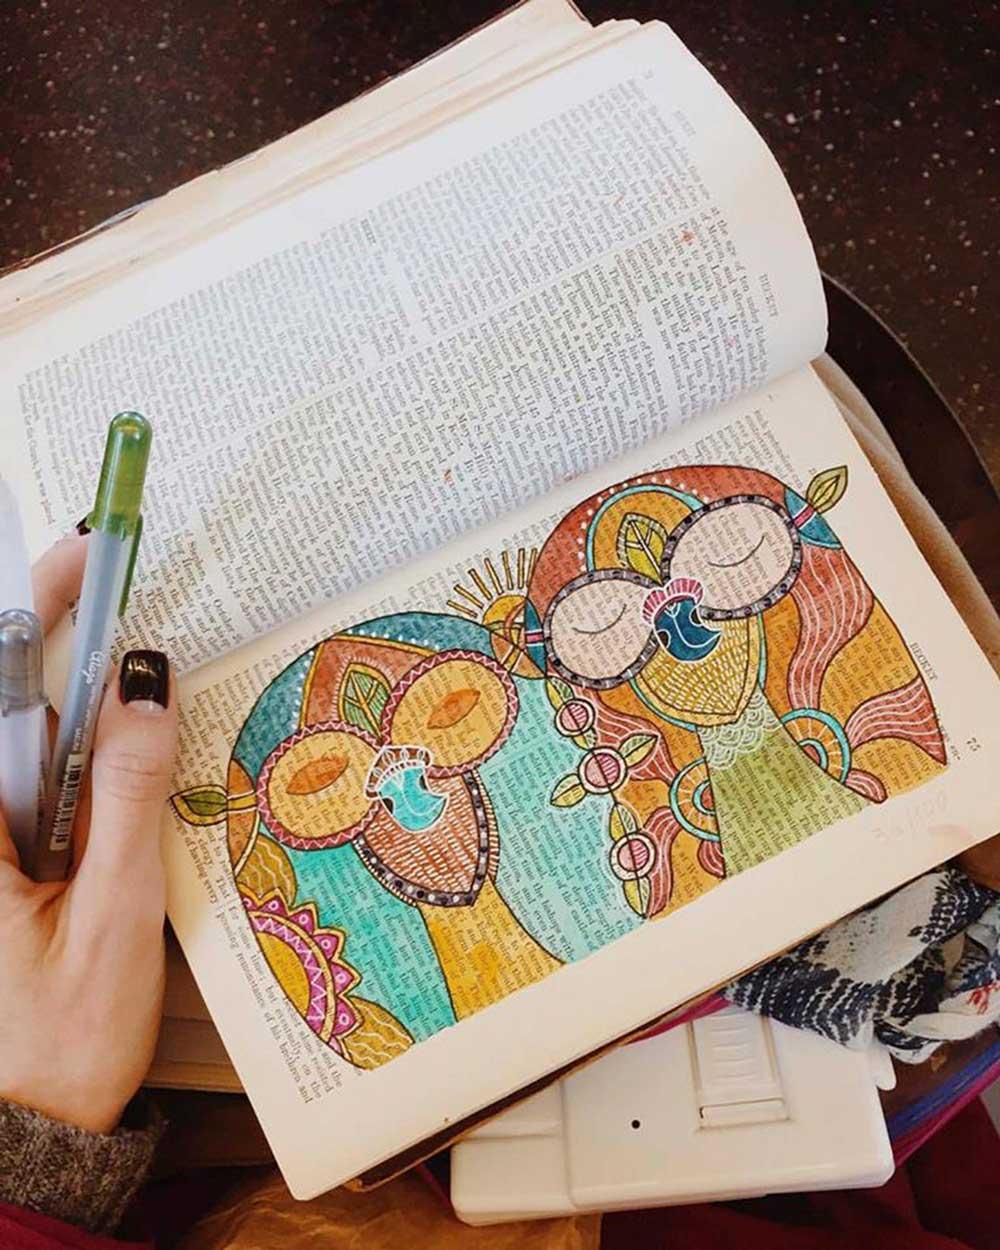 closeness-book-page-painting-eve-devore-36.jpg